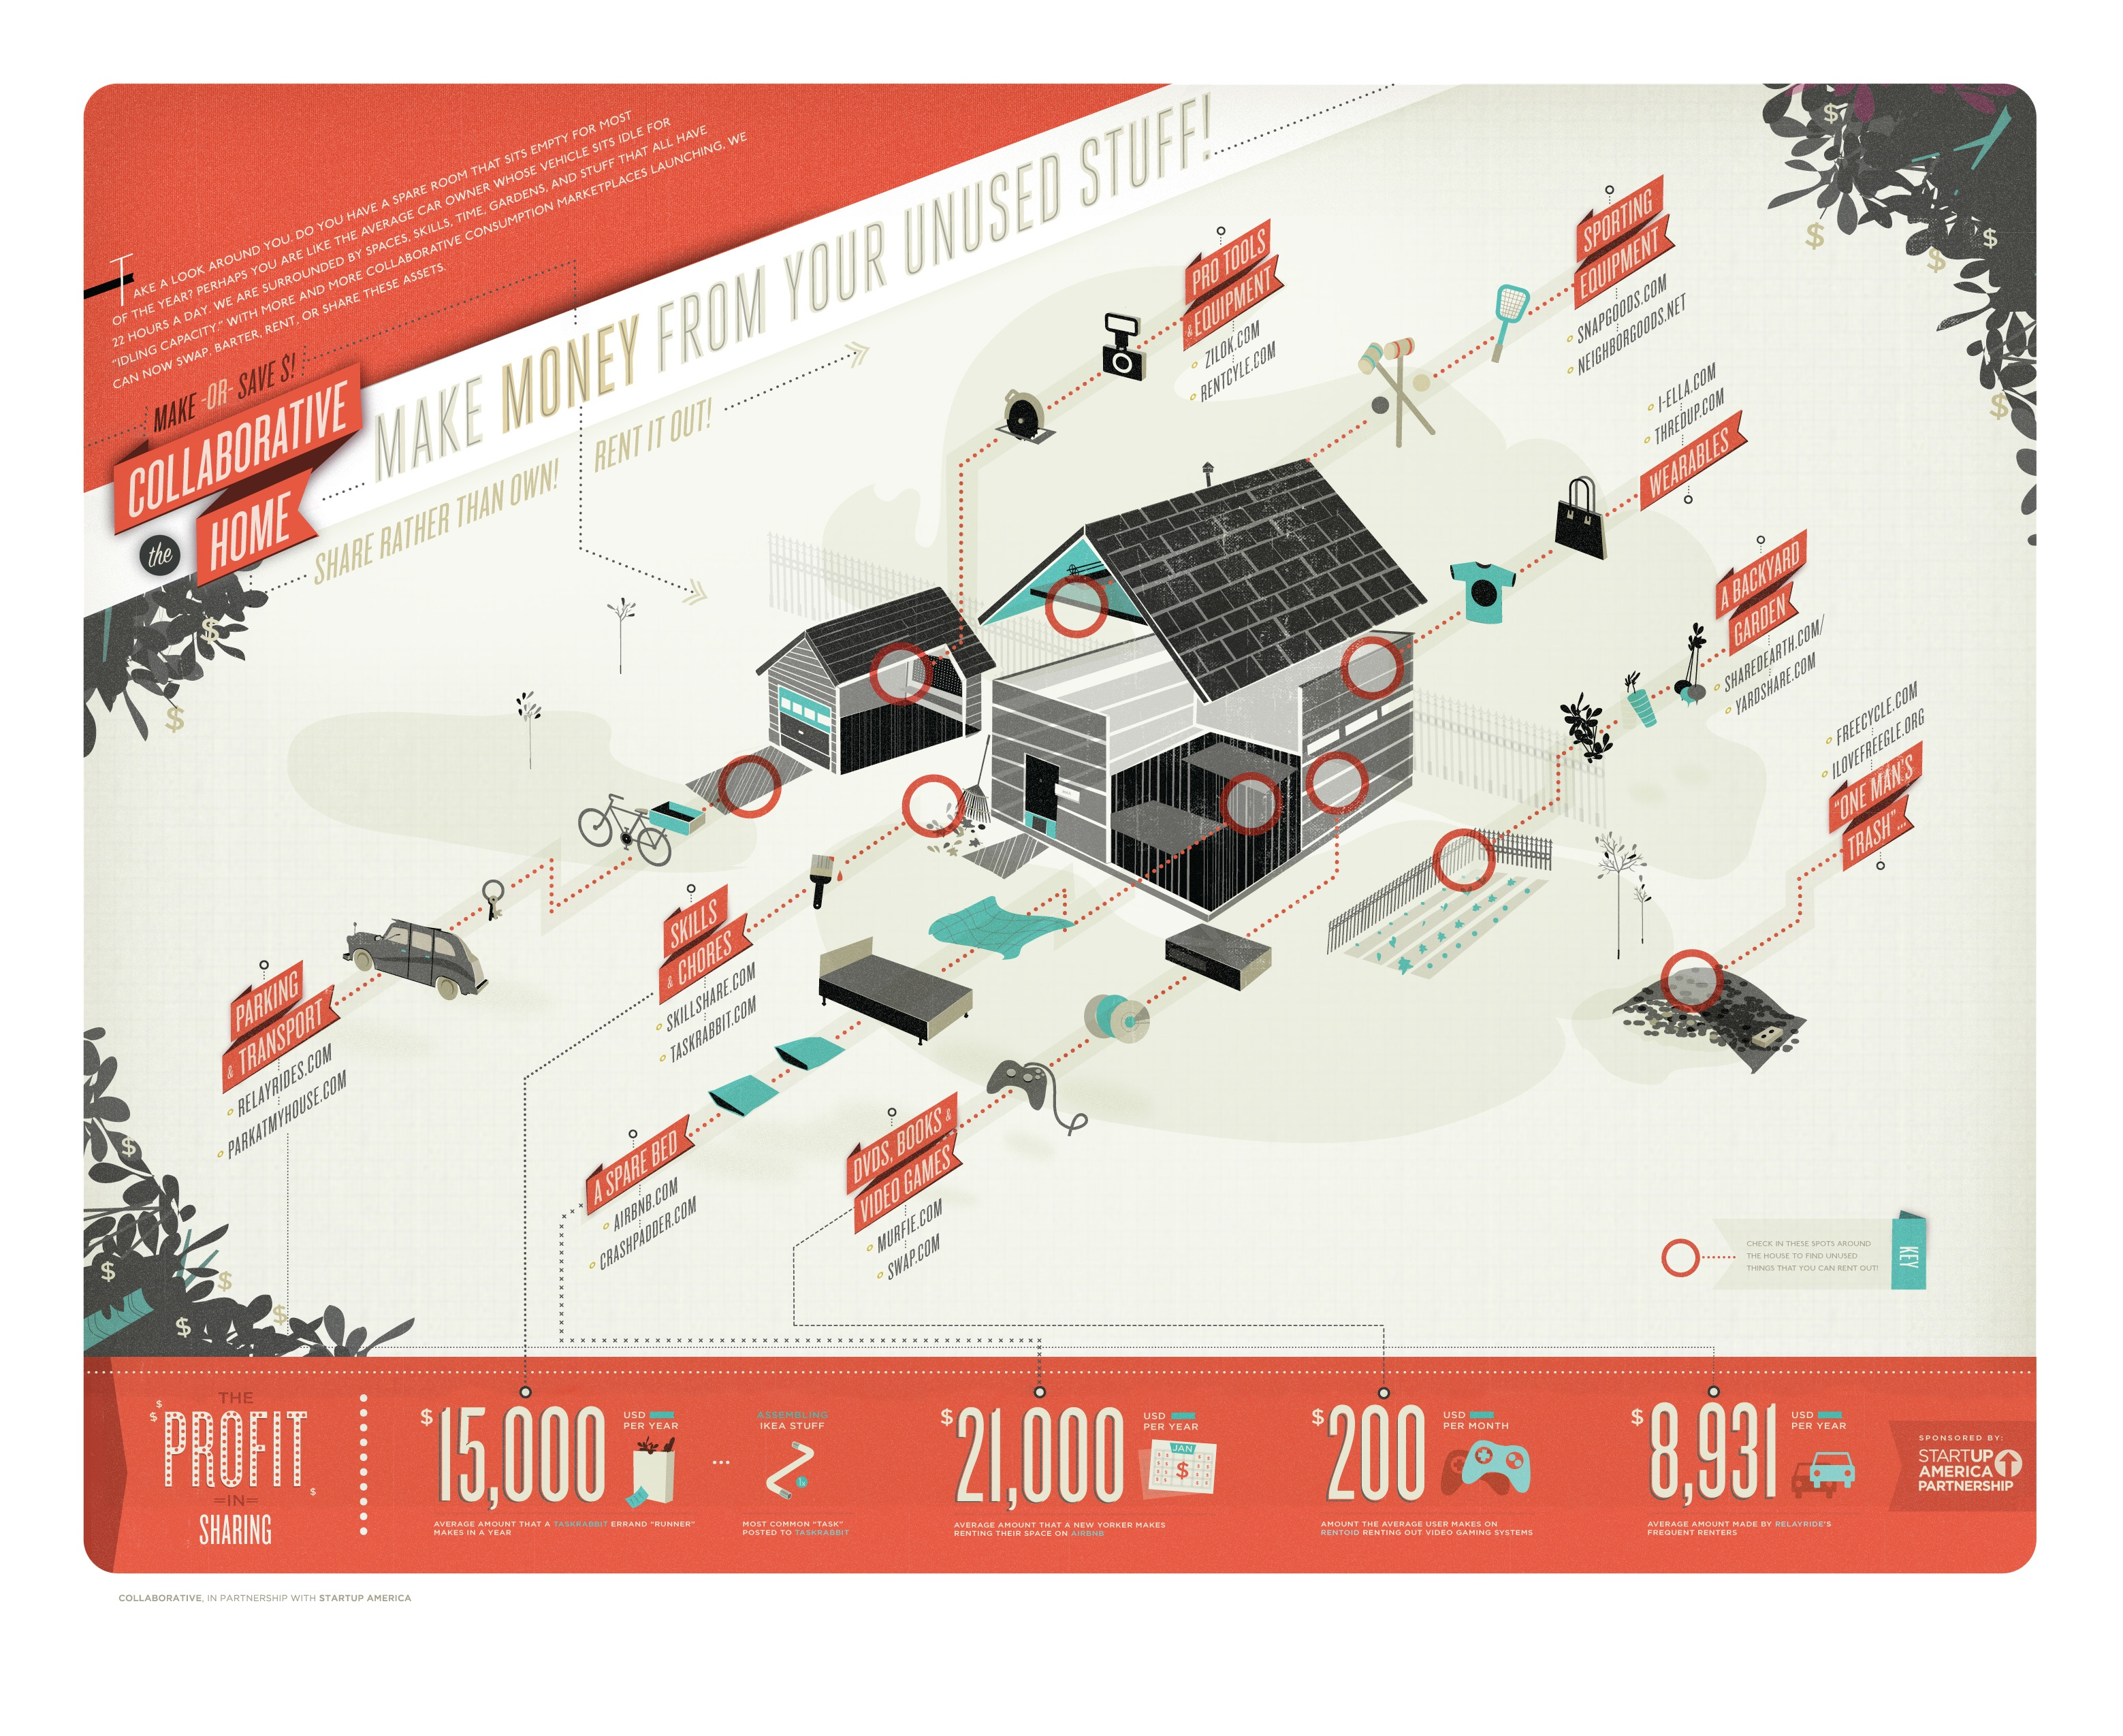 Infographic_Collaborative Home